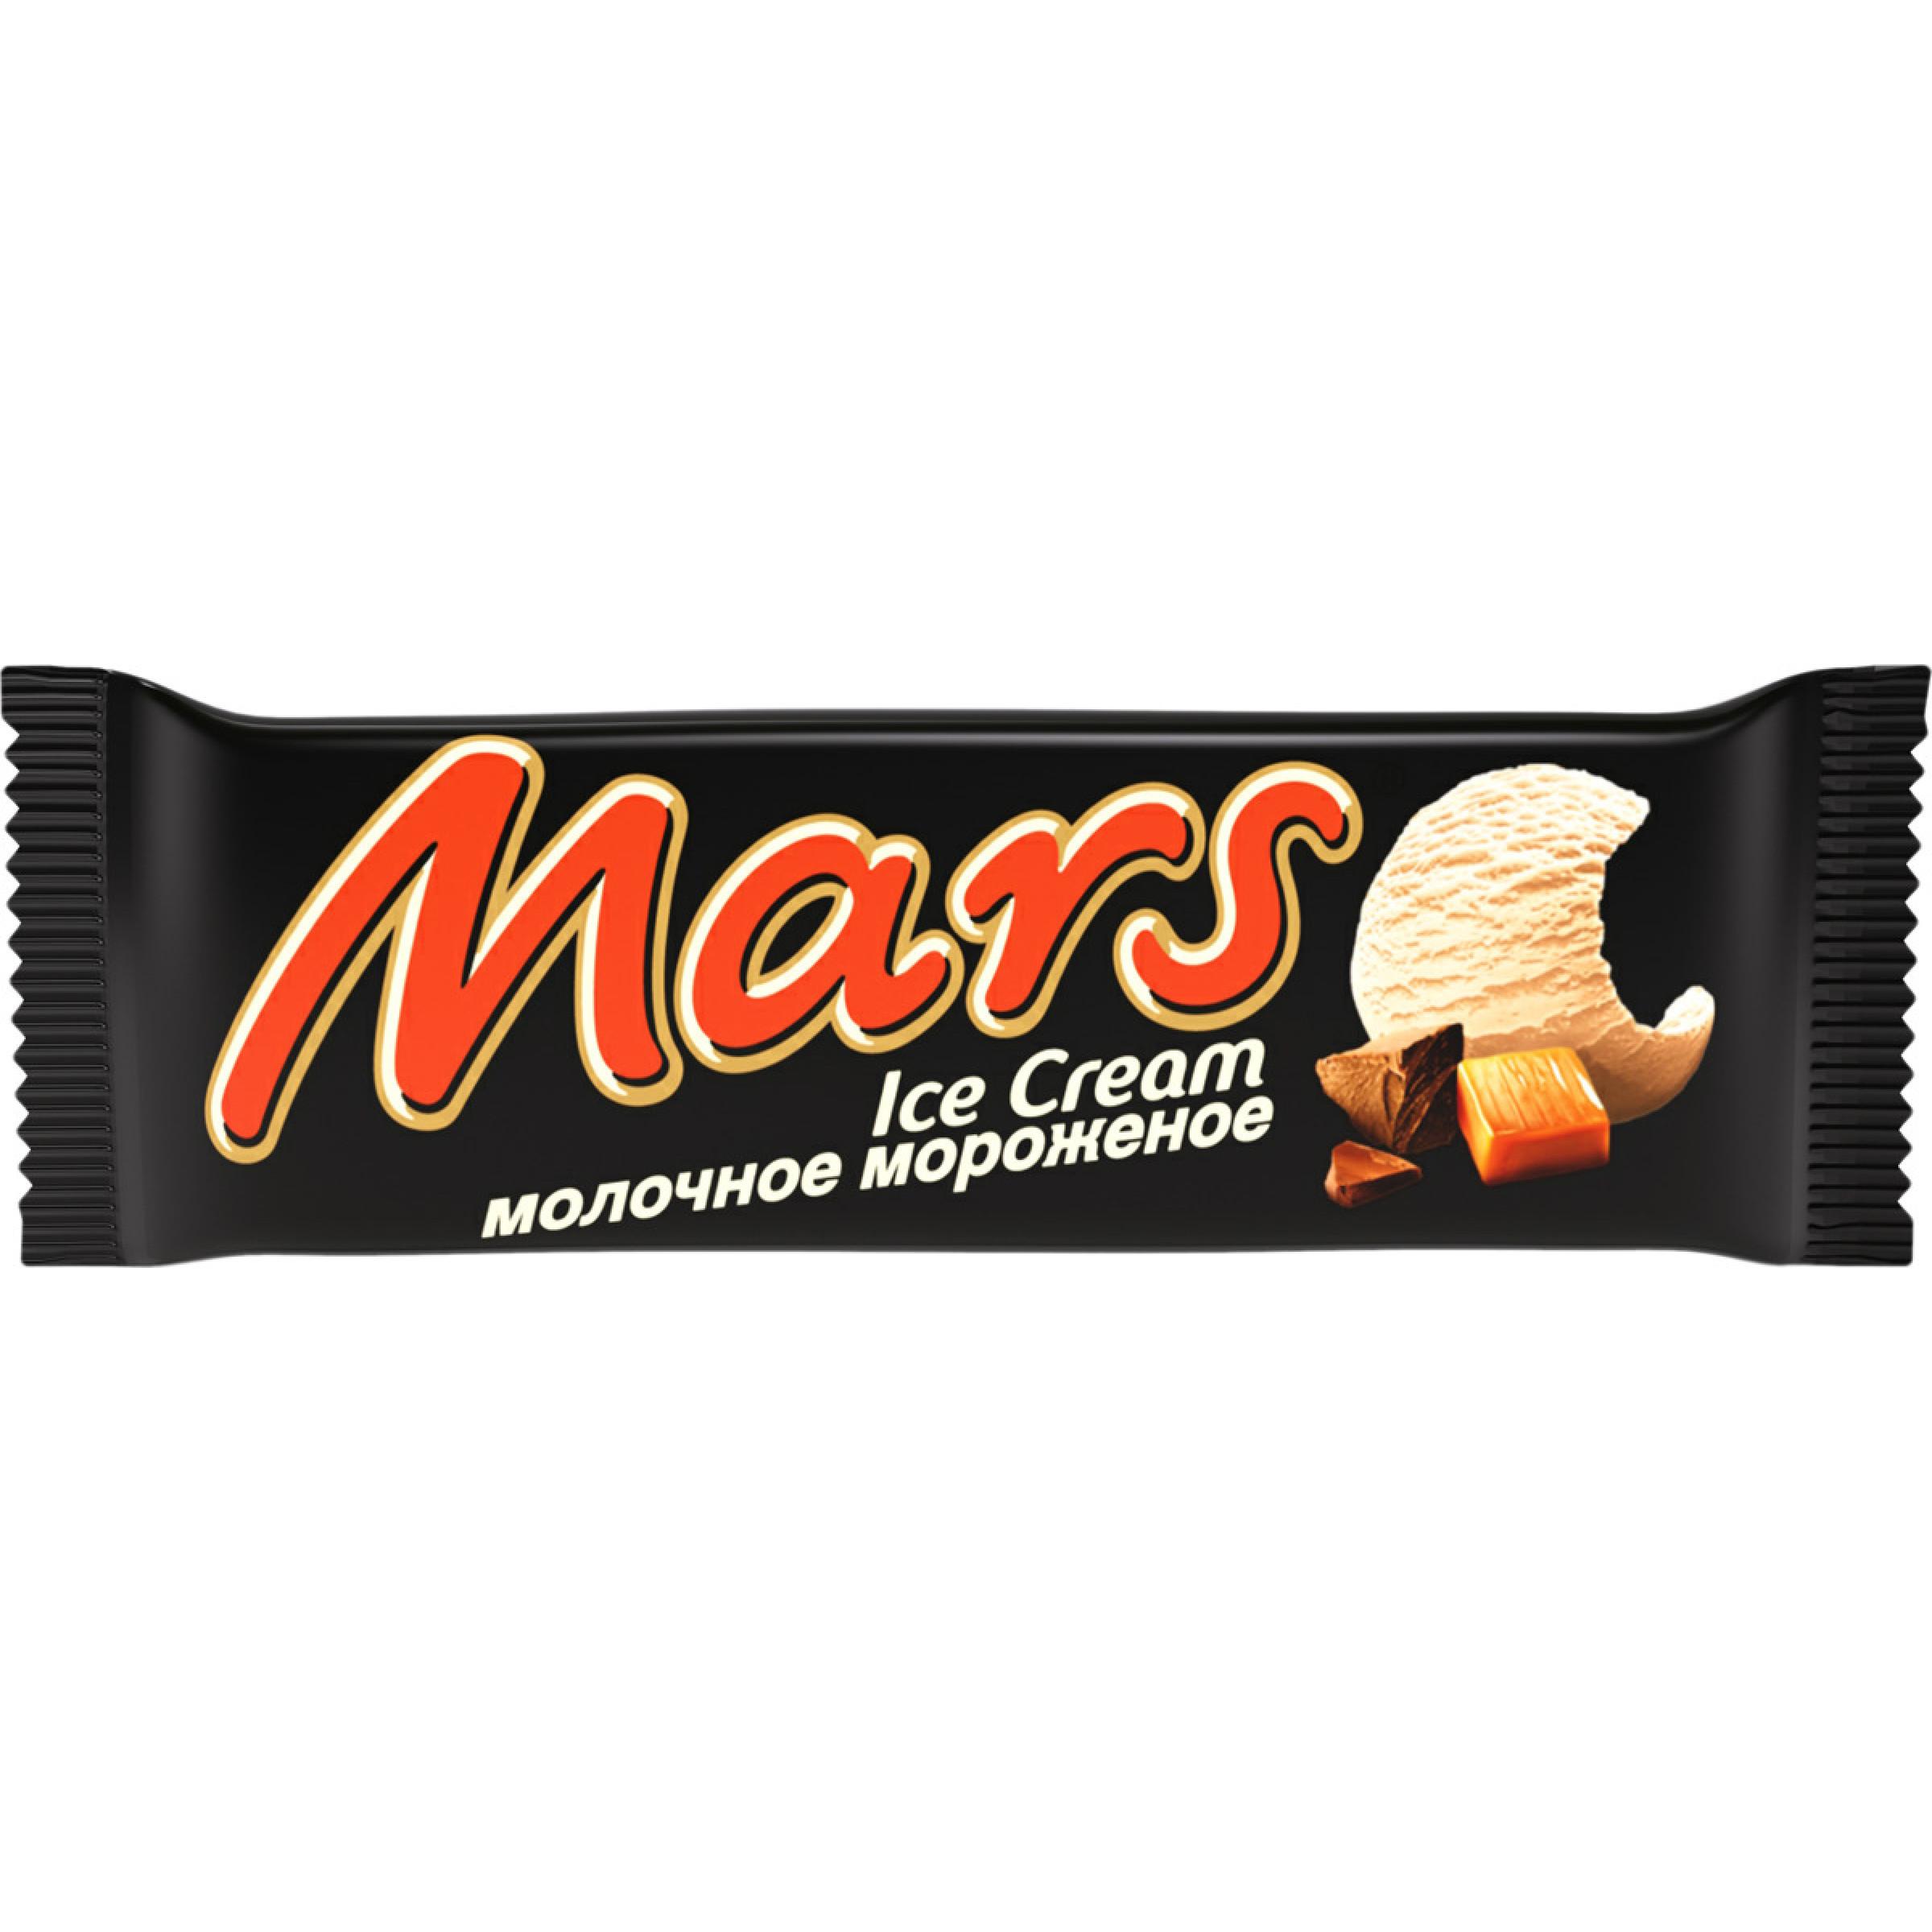 Мороженое Mars Батончик Марс, 41,8 гр